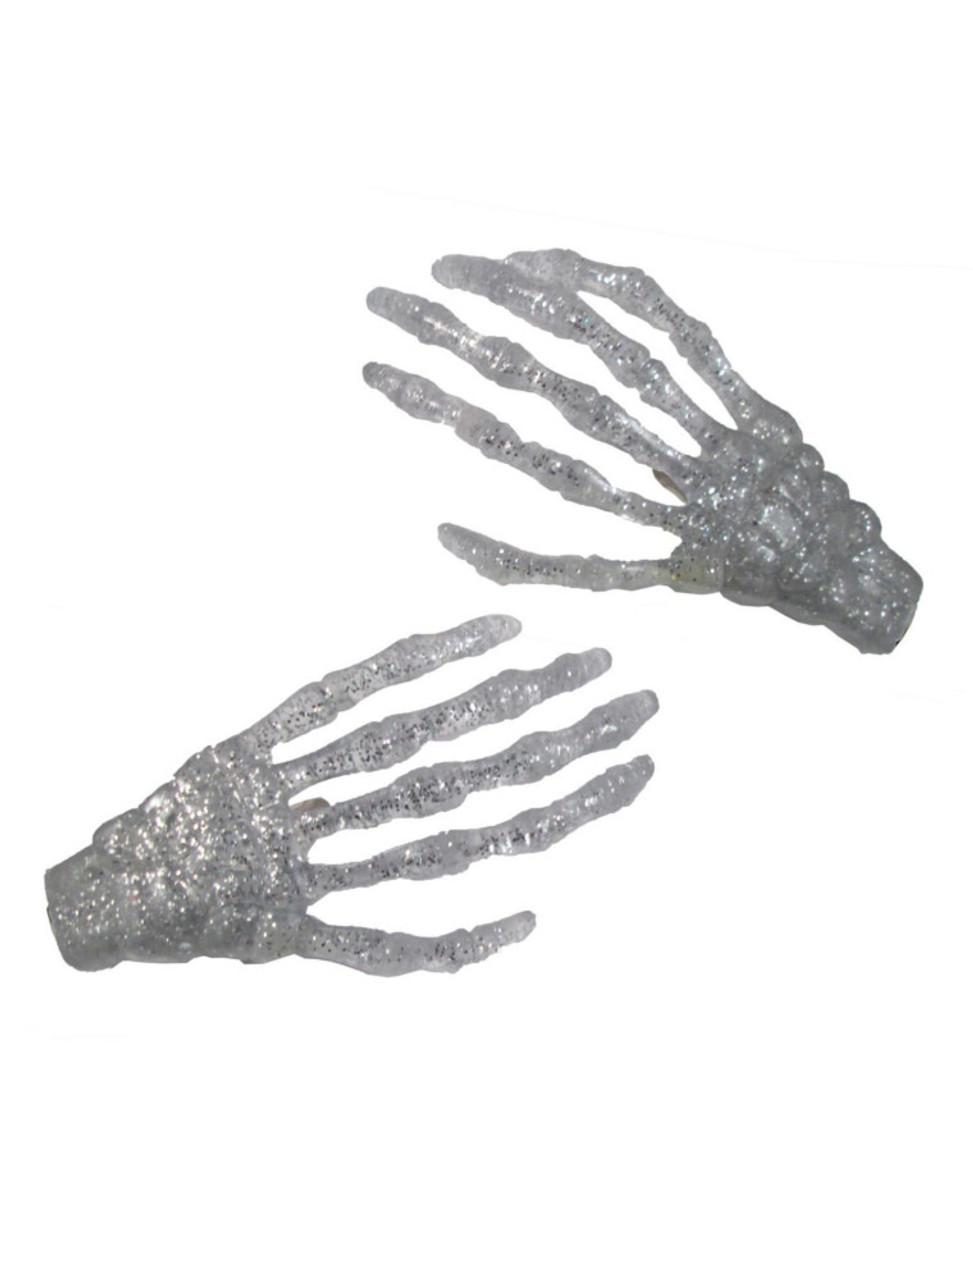 White Skeleton Hands Necklace Halloween Horror Jewelry Kreepsville